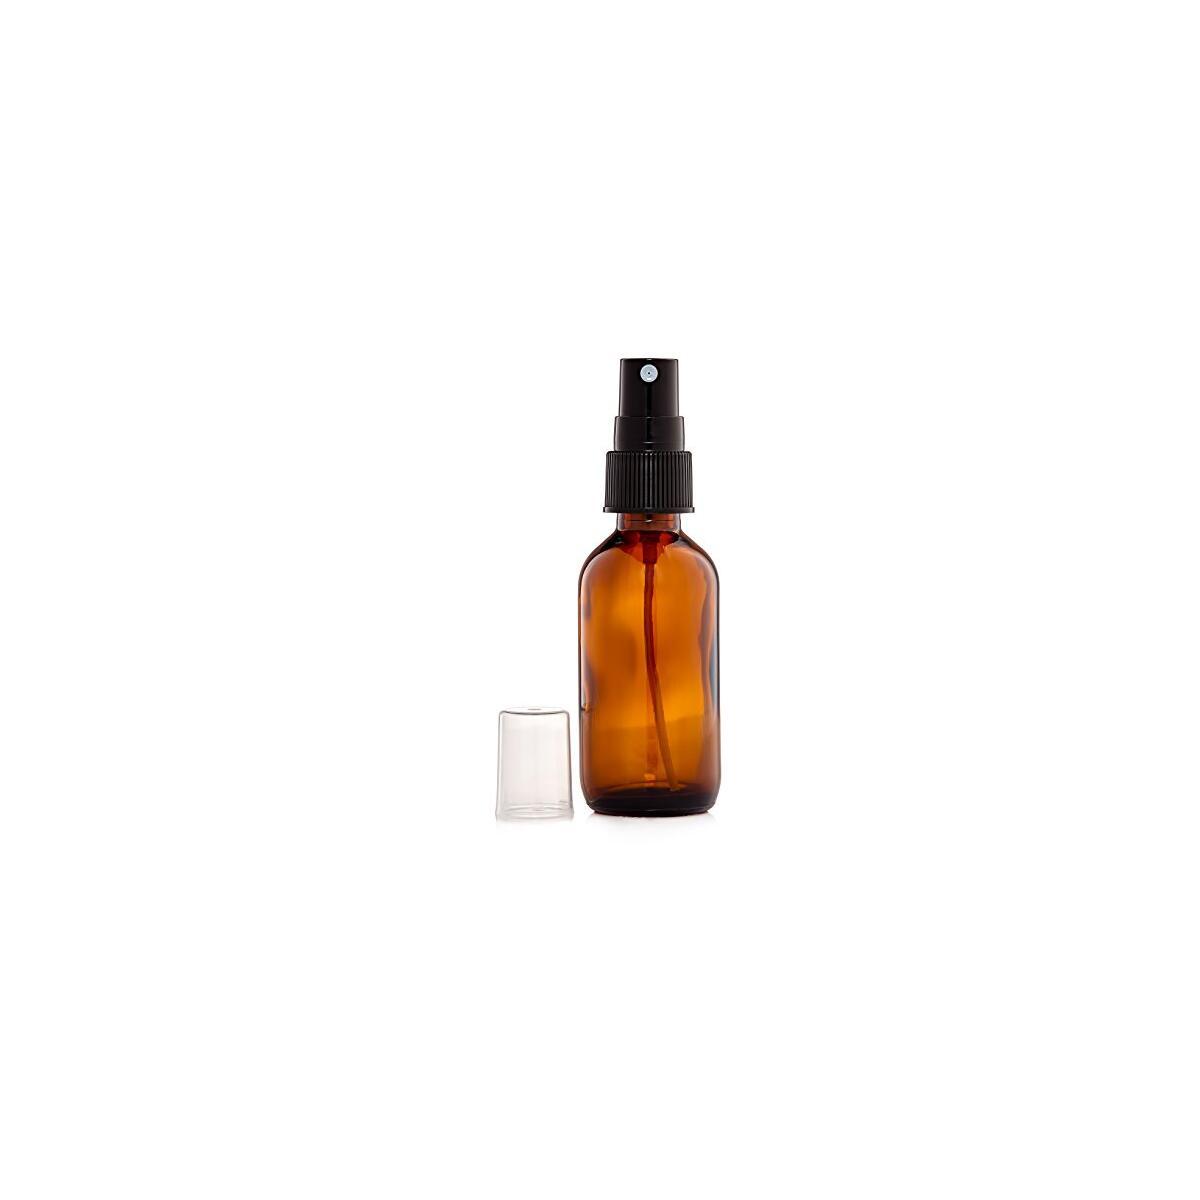 Small 2 oz Glass Spray Bottles